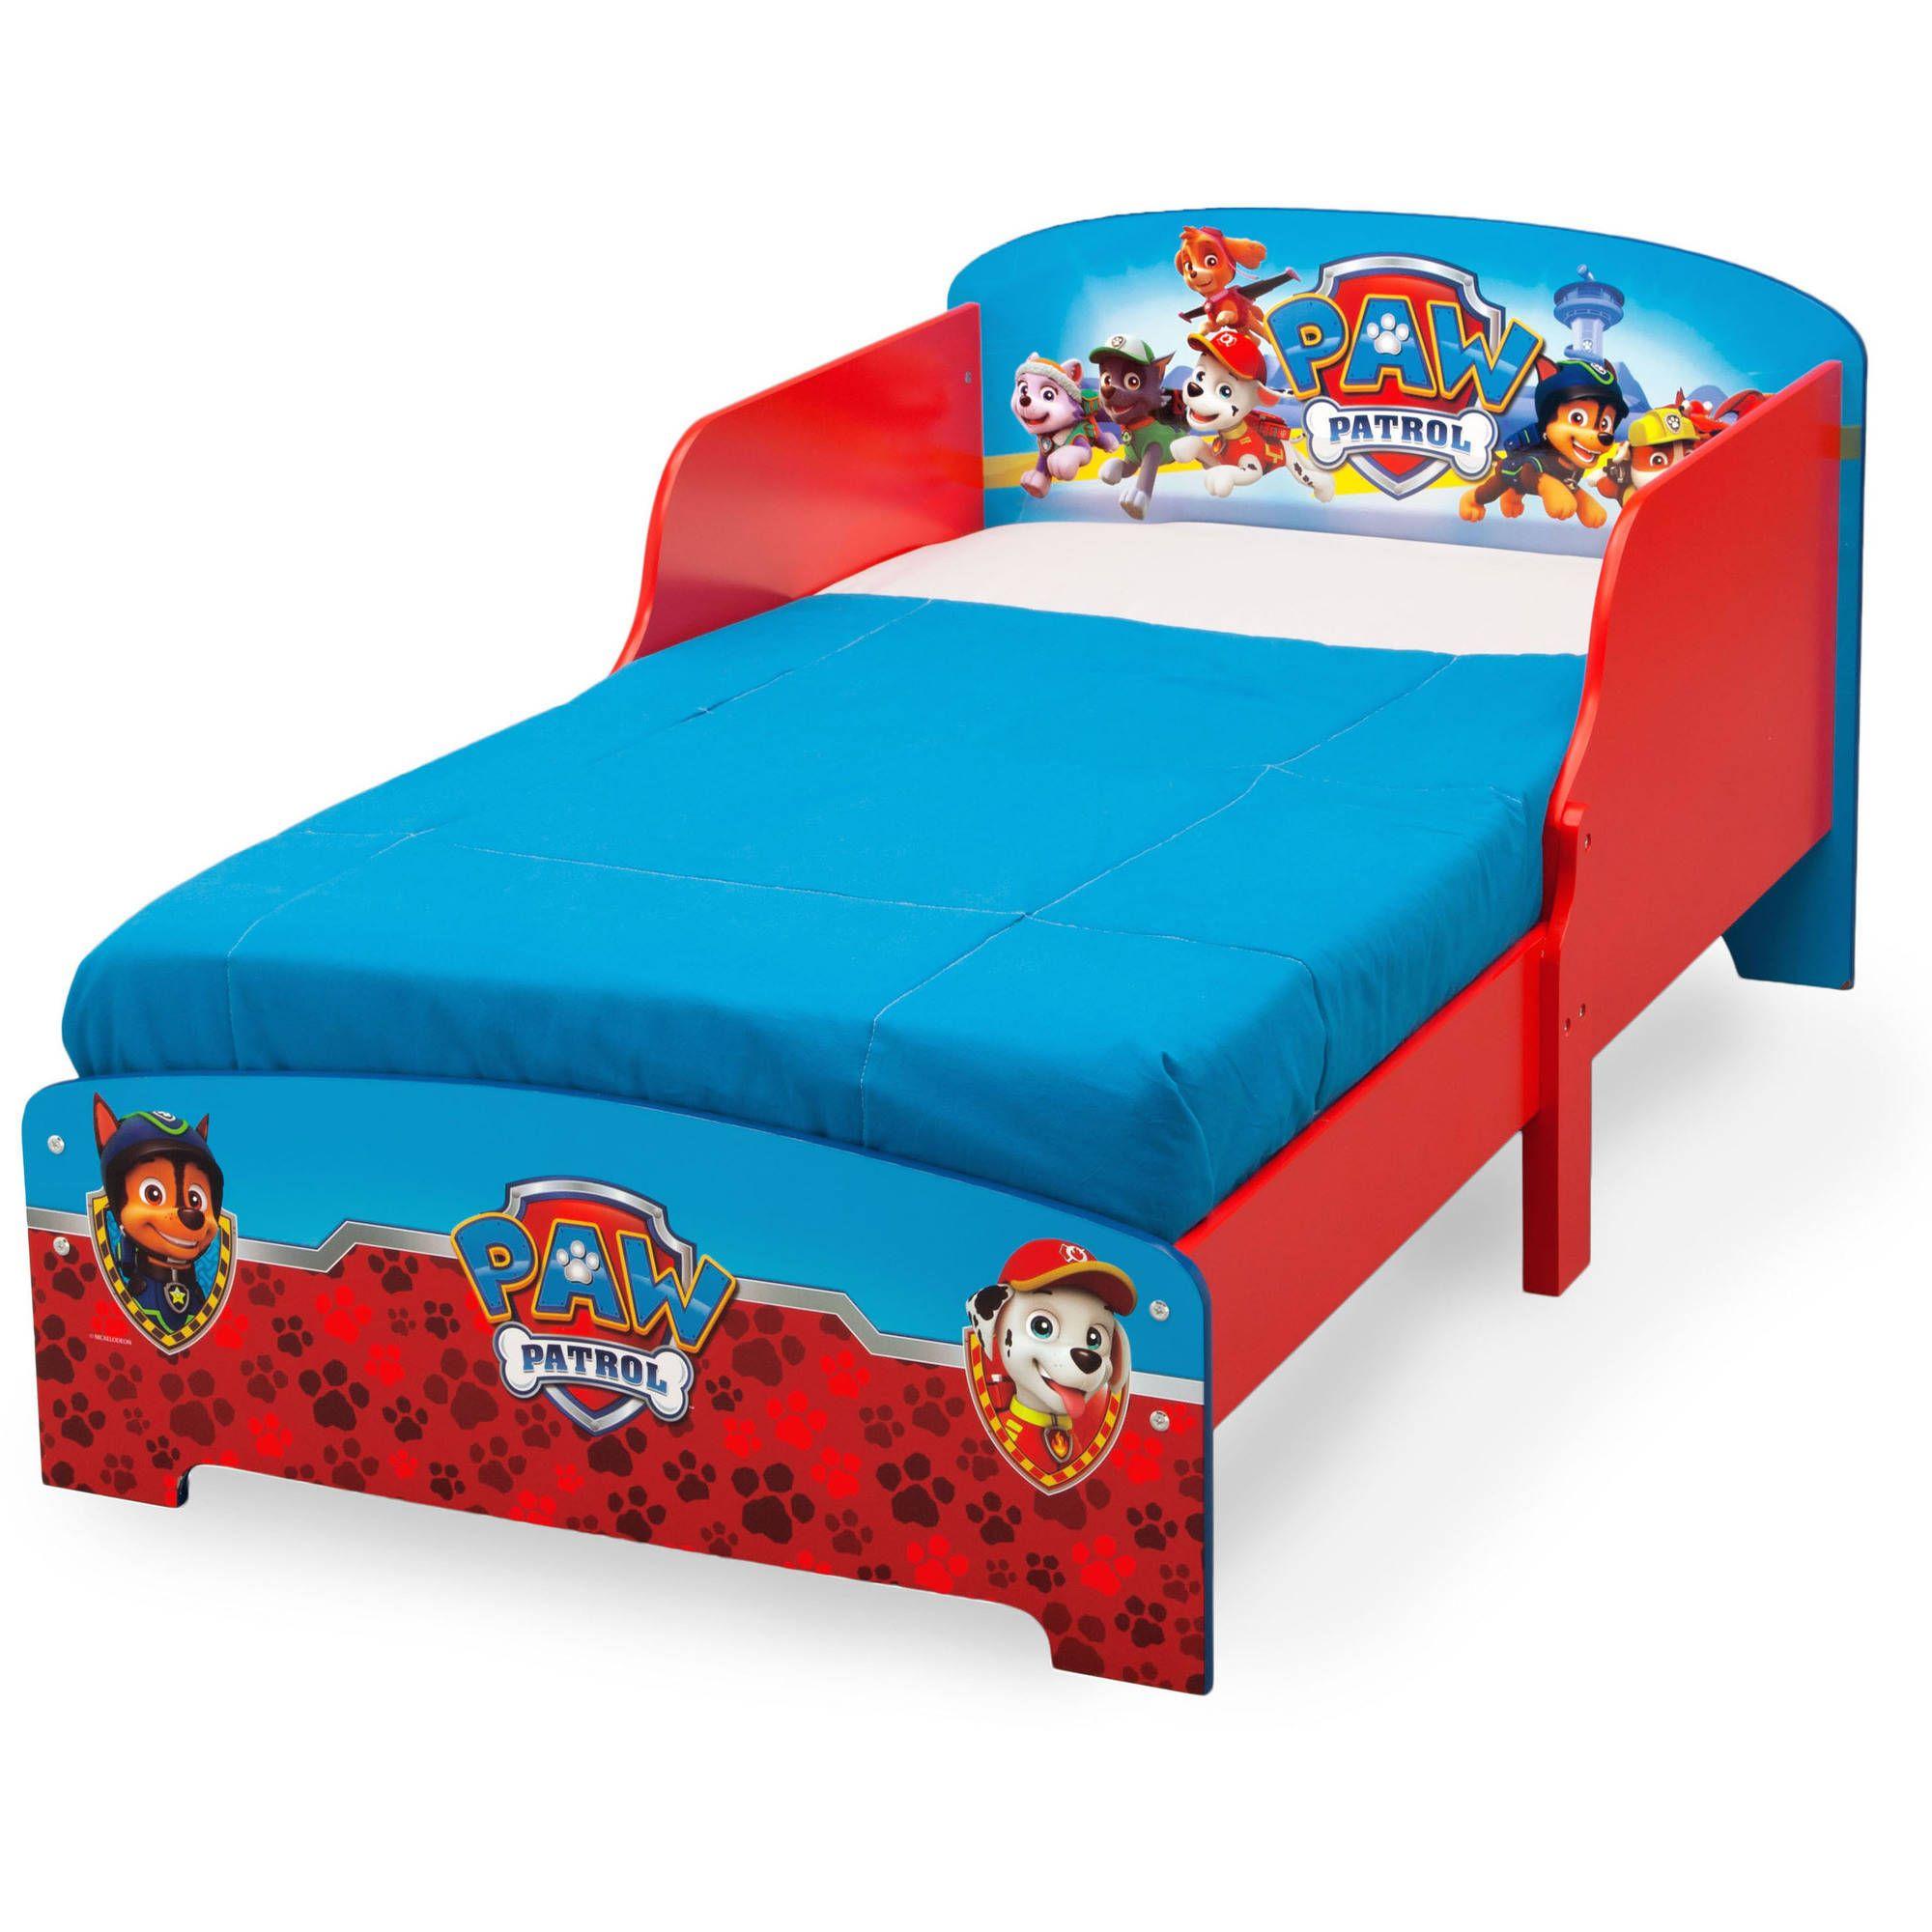 Paw Patrol Wooden Toddler Bed Walmartcom Toddler Bedroom For